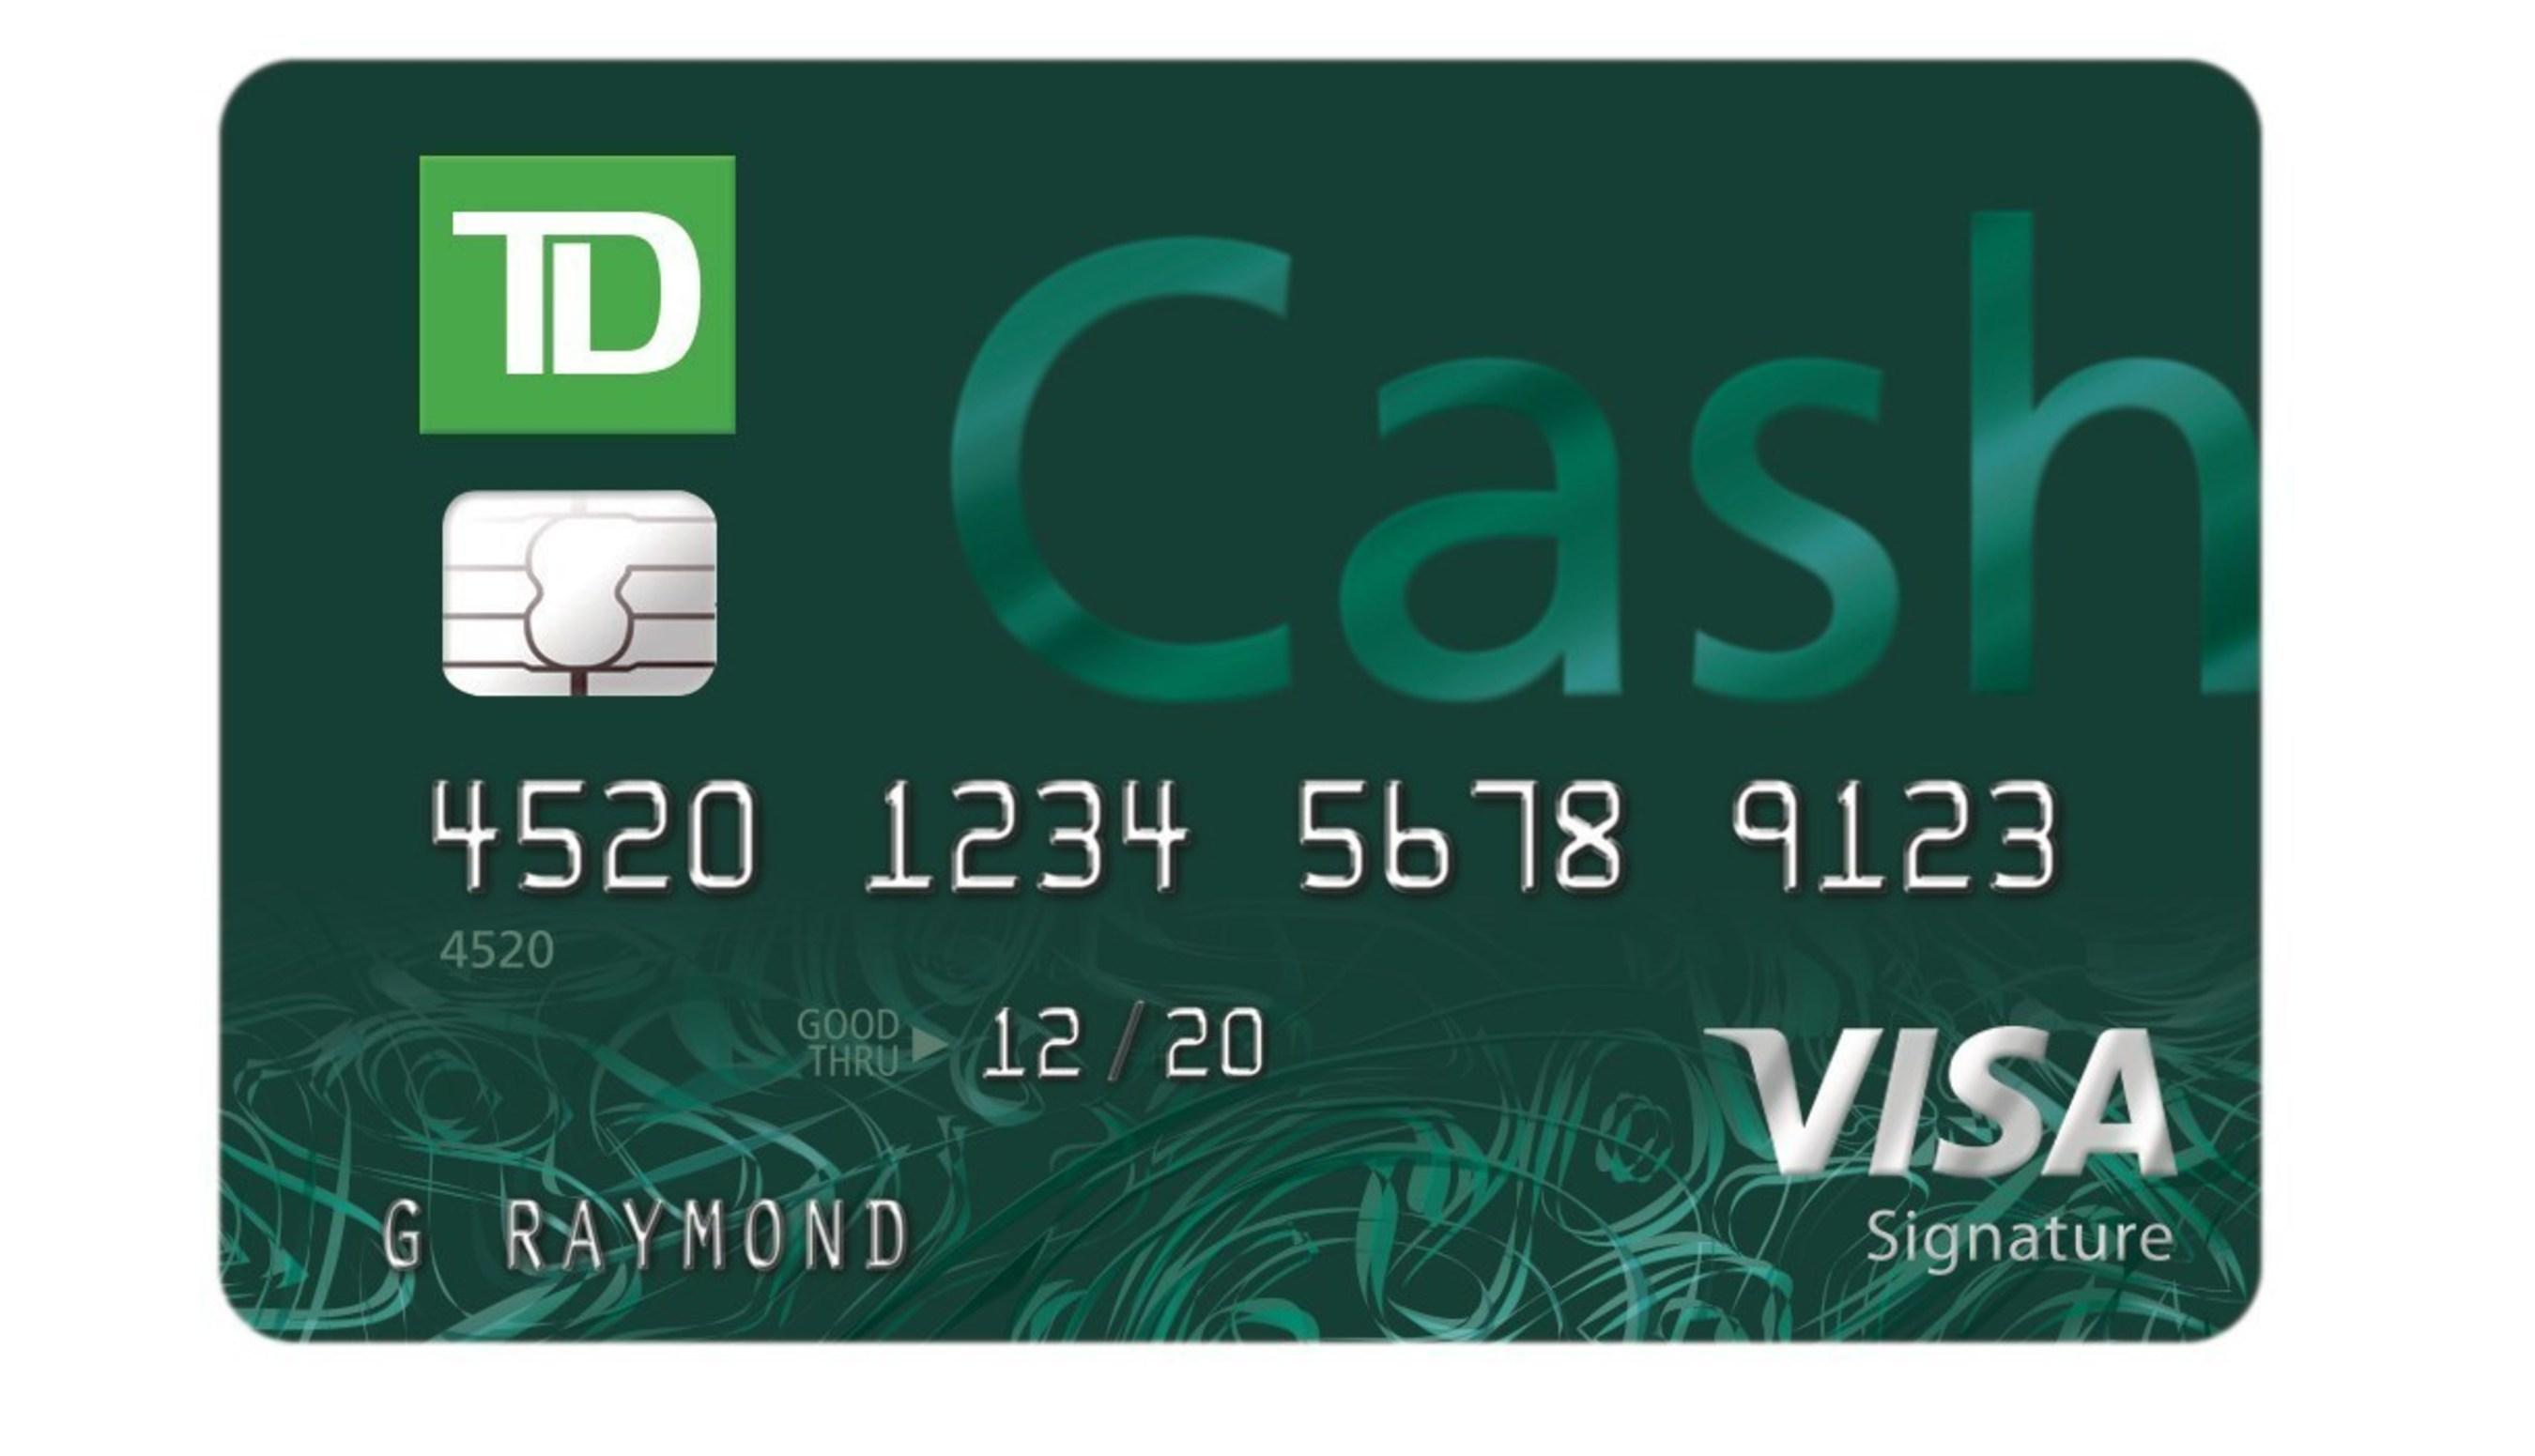 Td bank launches new cash rewards credit card td cash visa signature credit card reheart Gallery